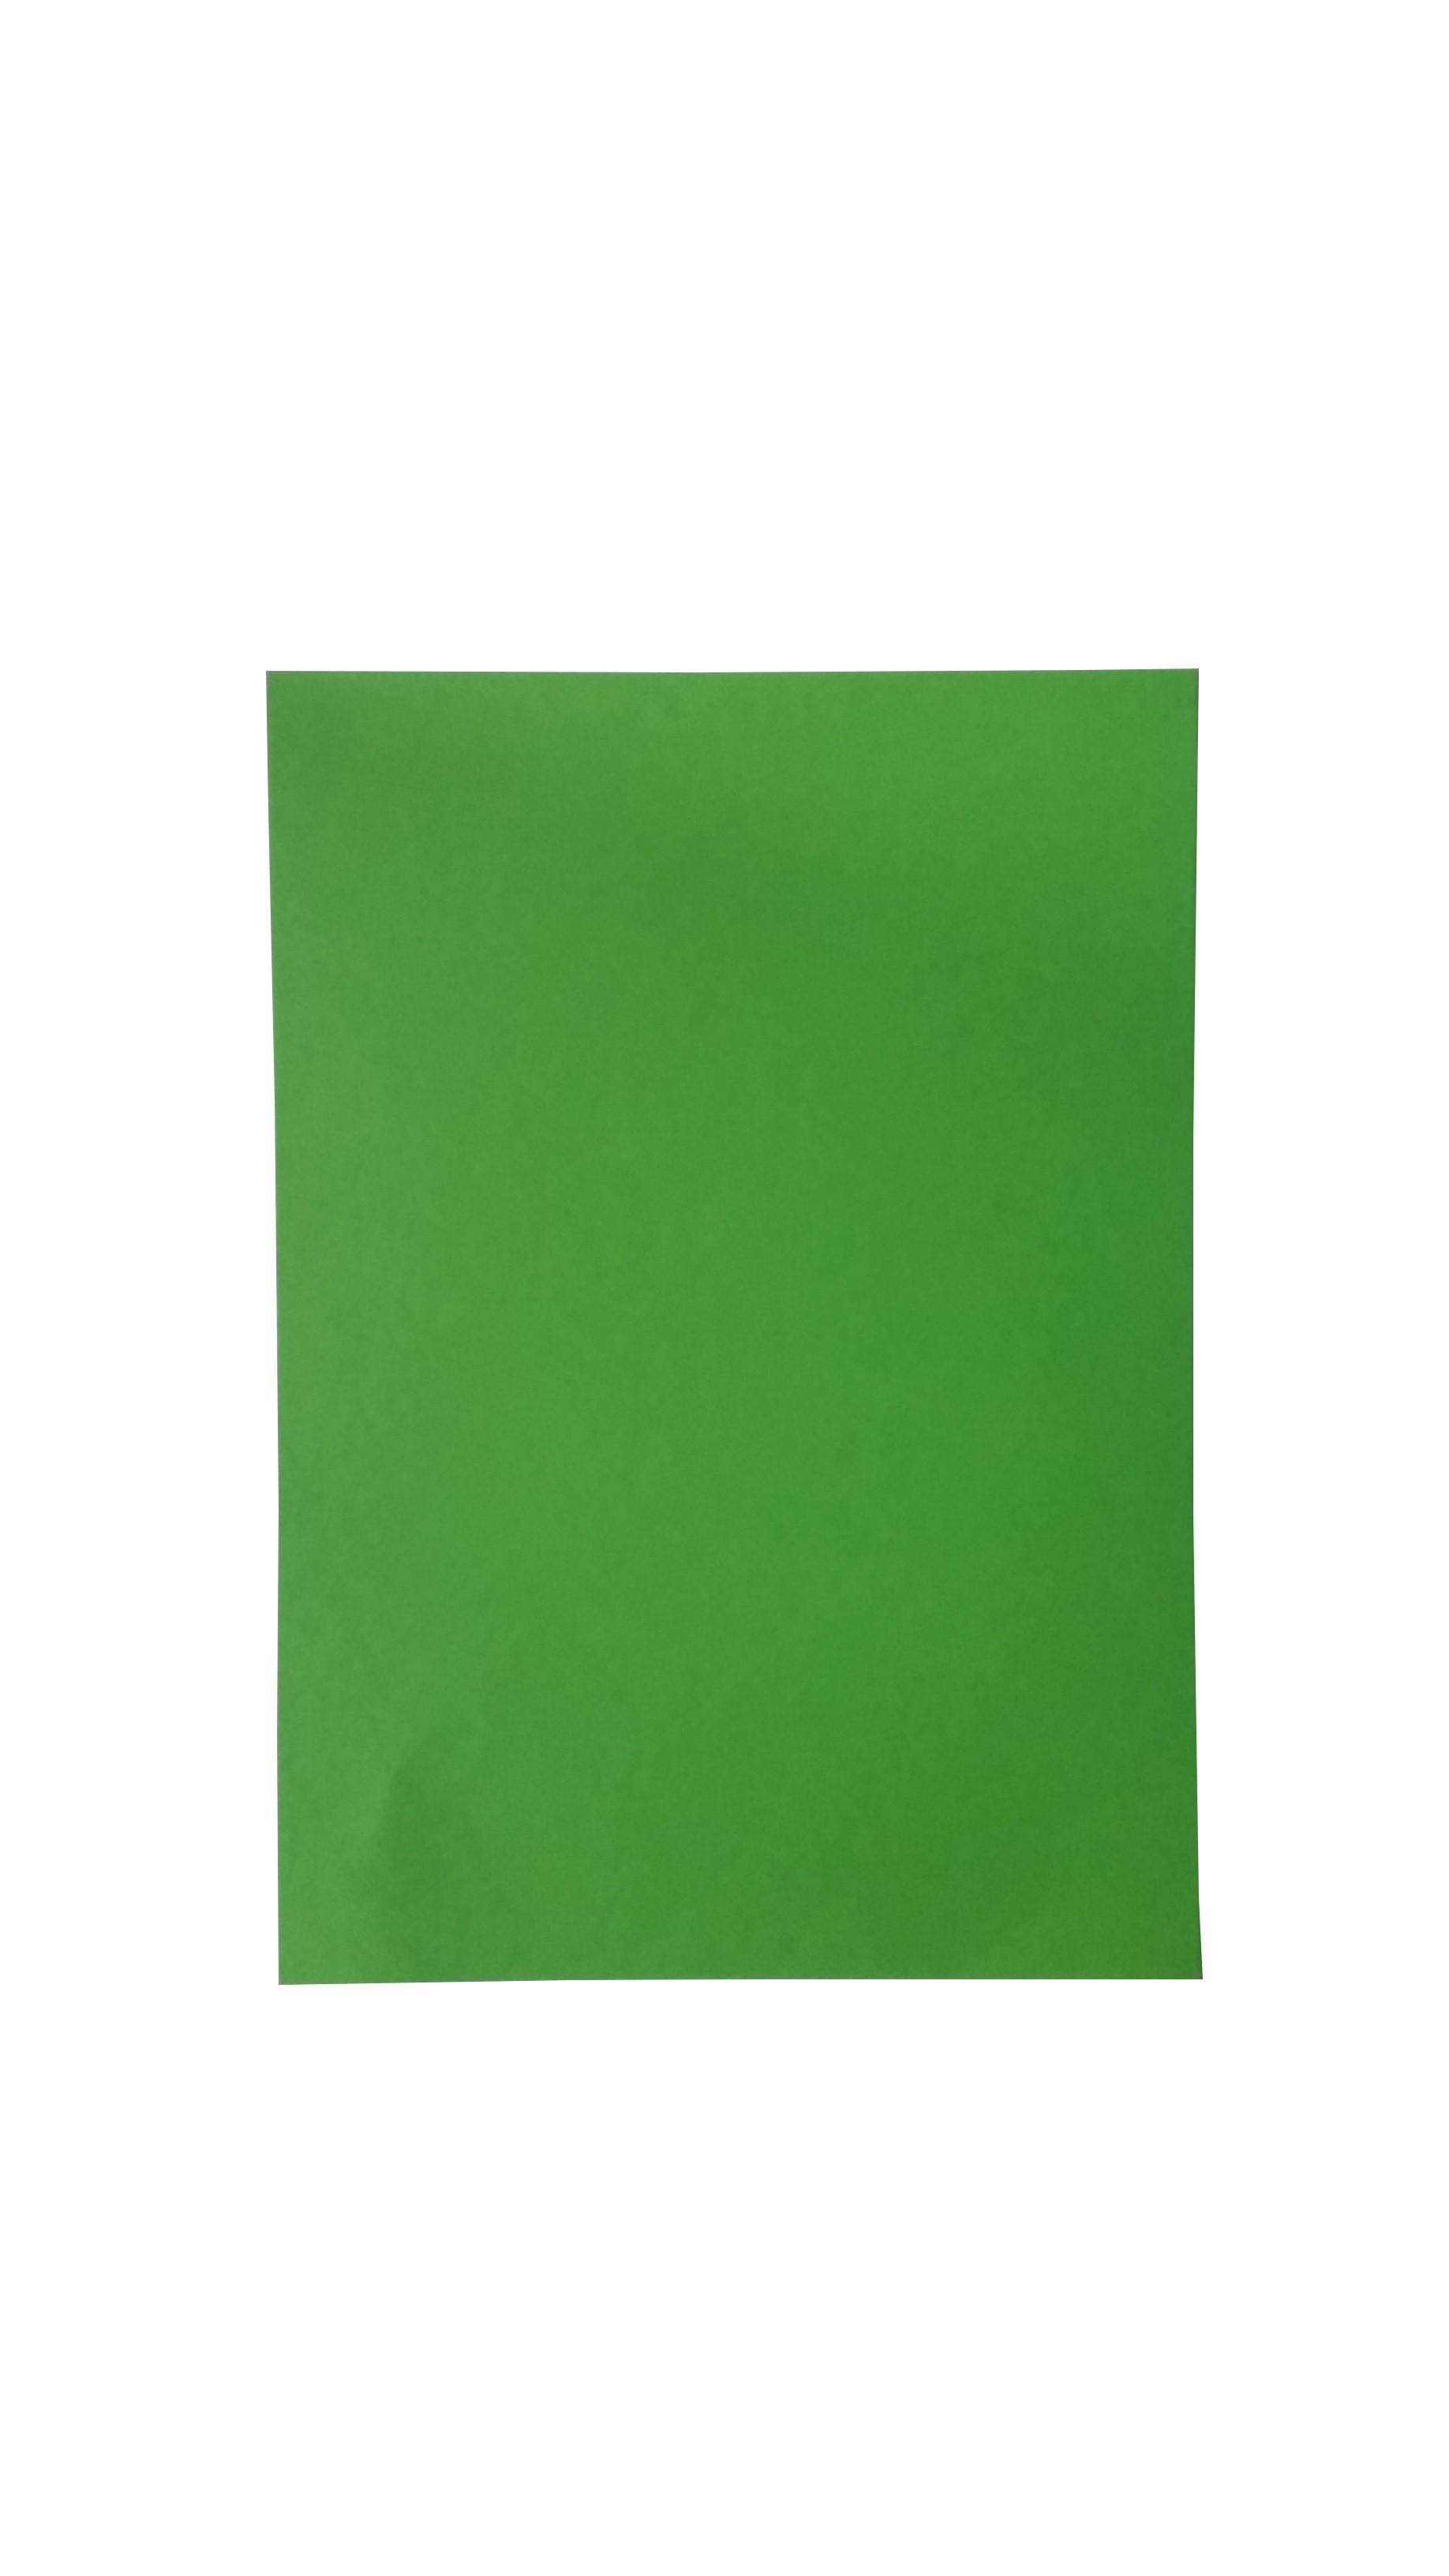 Vykres Farebny Zeleny A4 180g 200 Listov Papier Obaly Sk